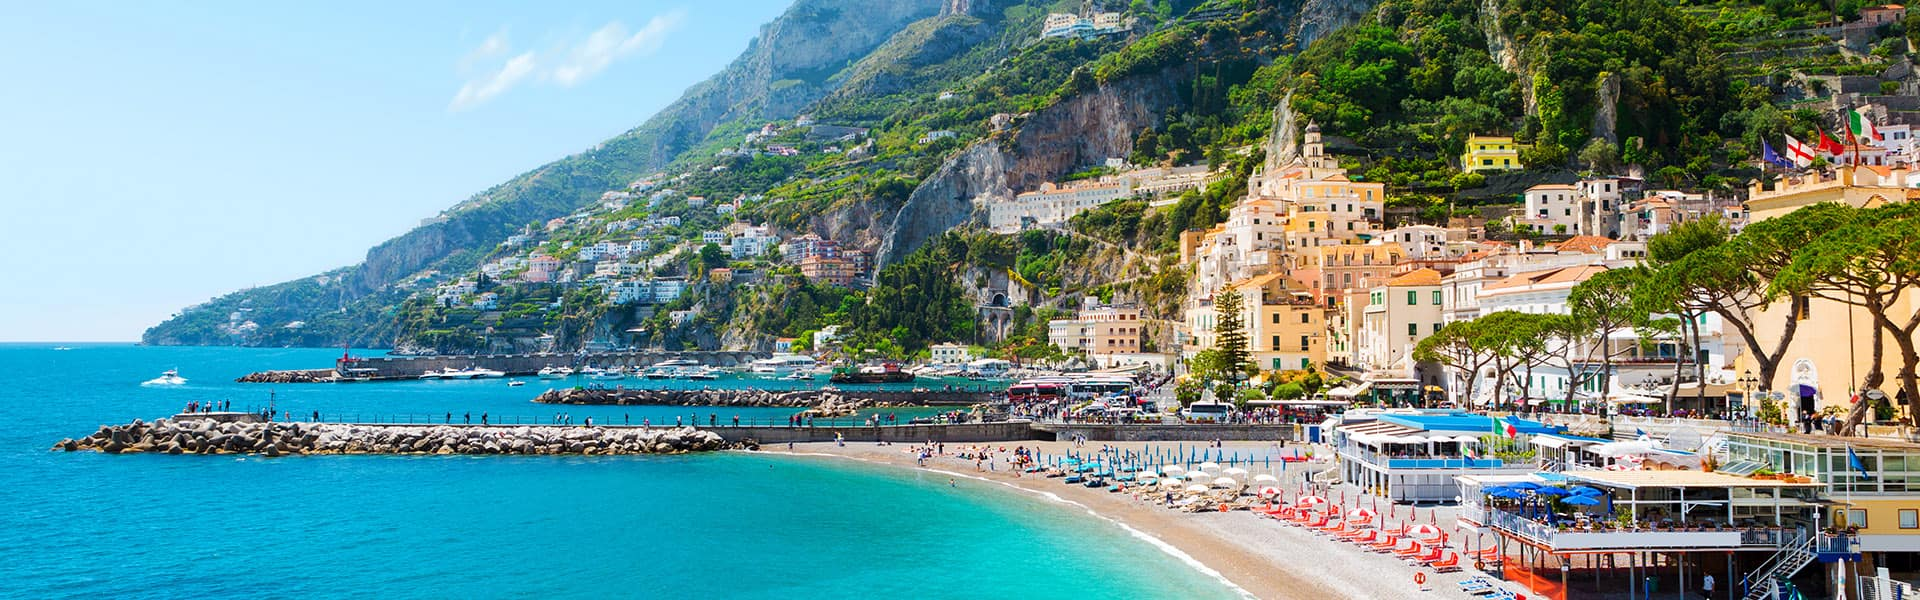 Greek Isles: Santorini, Mykonos & Florence